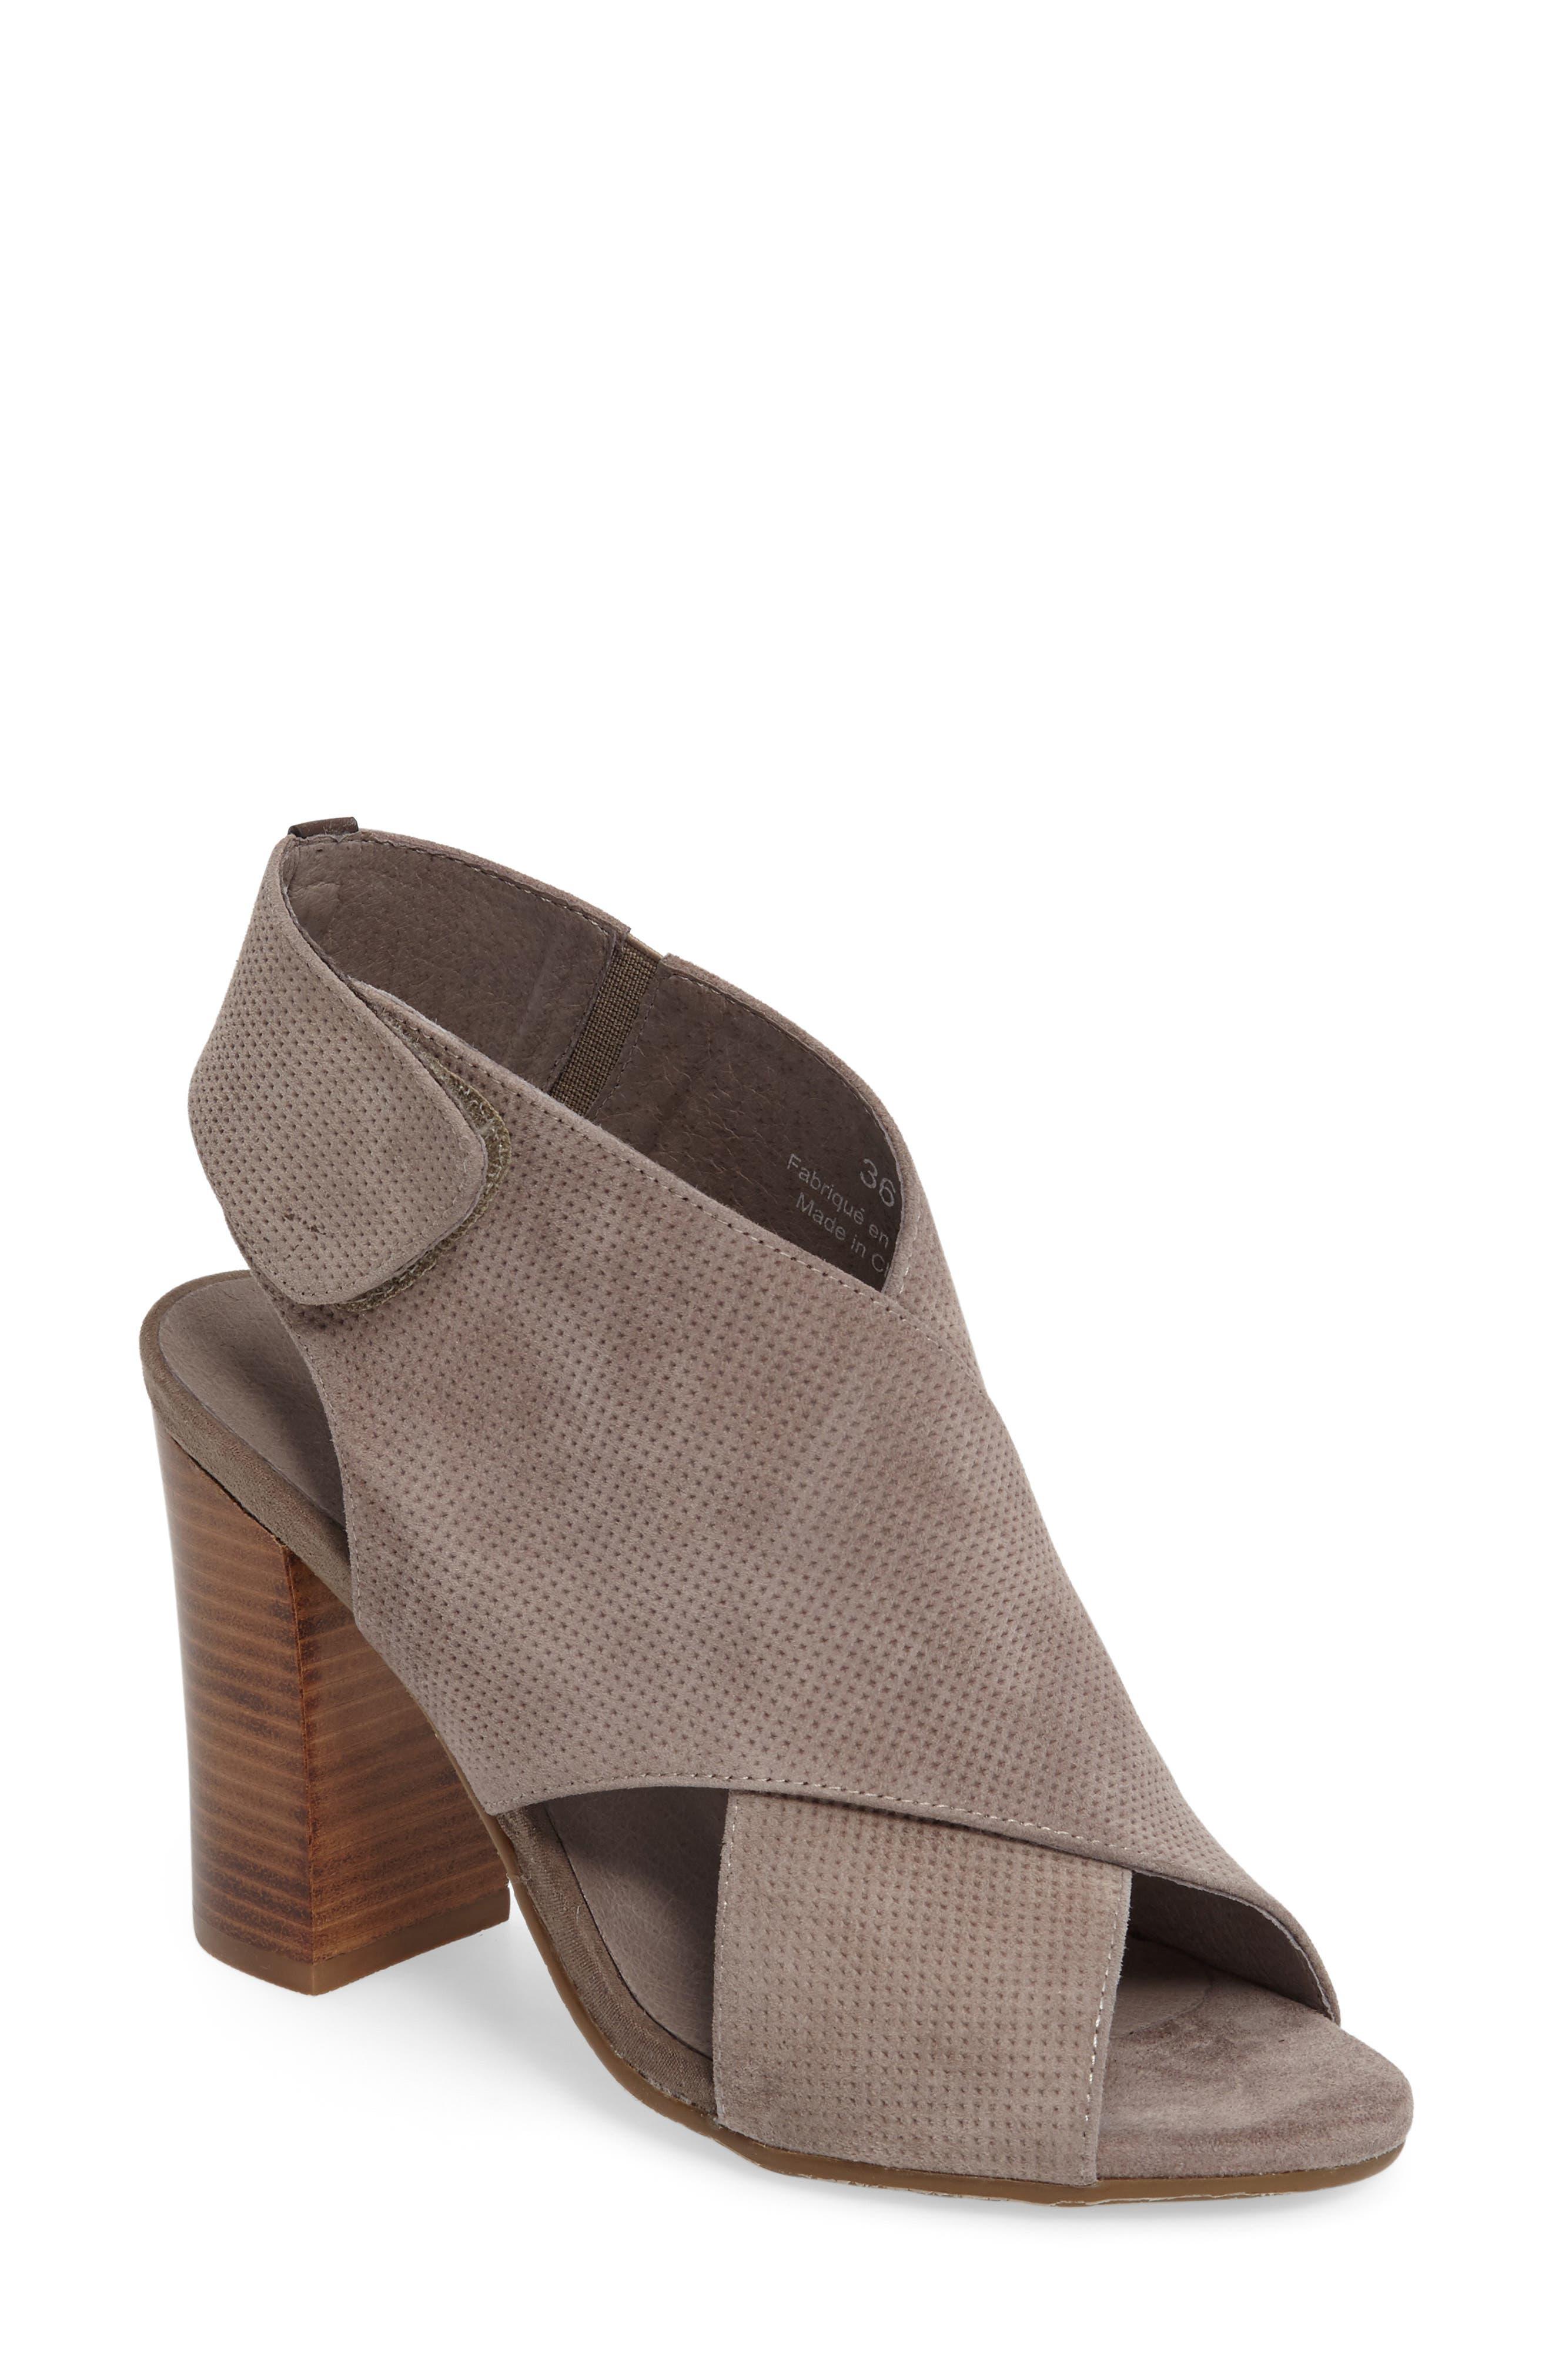 Rudsak Benedetta Block Heel Sandal (Women)